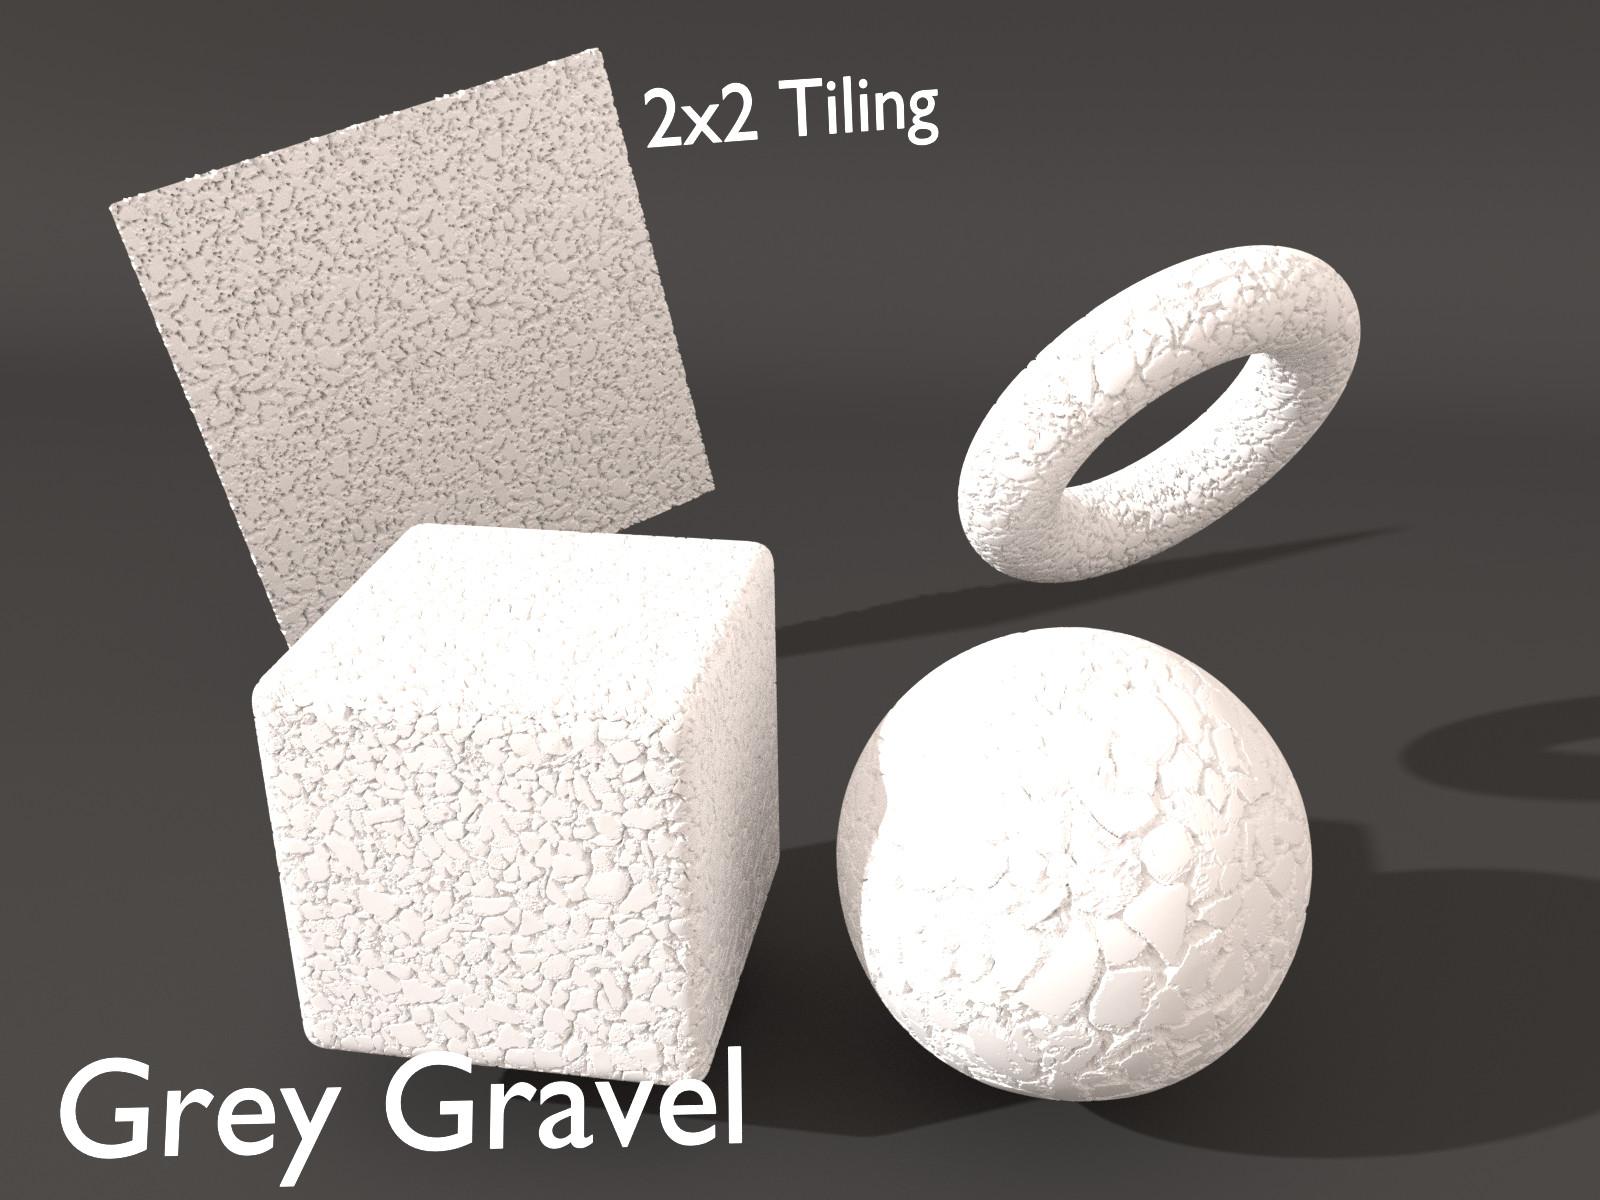 Sieben corgie greygravel l